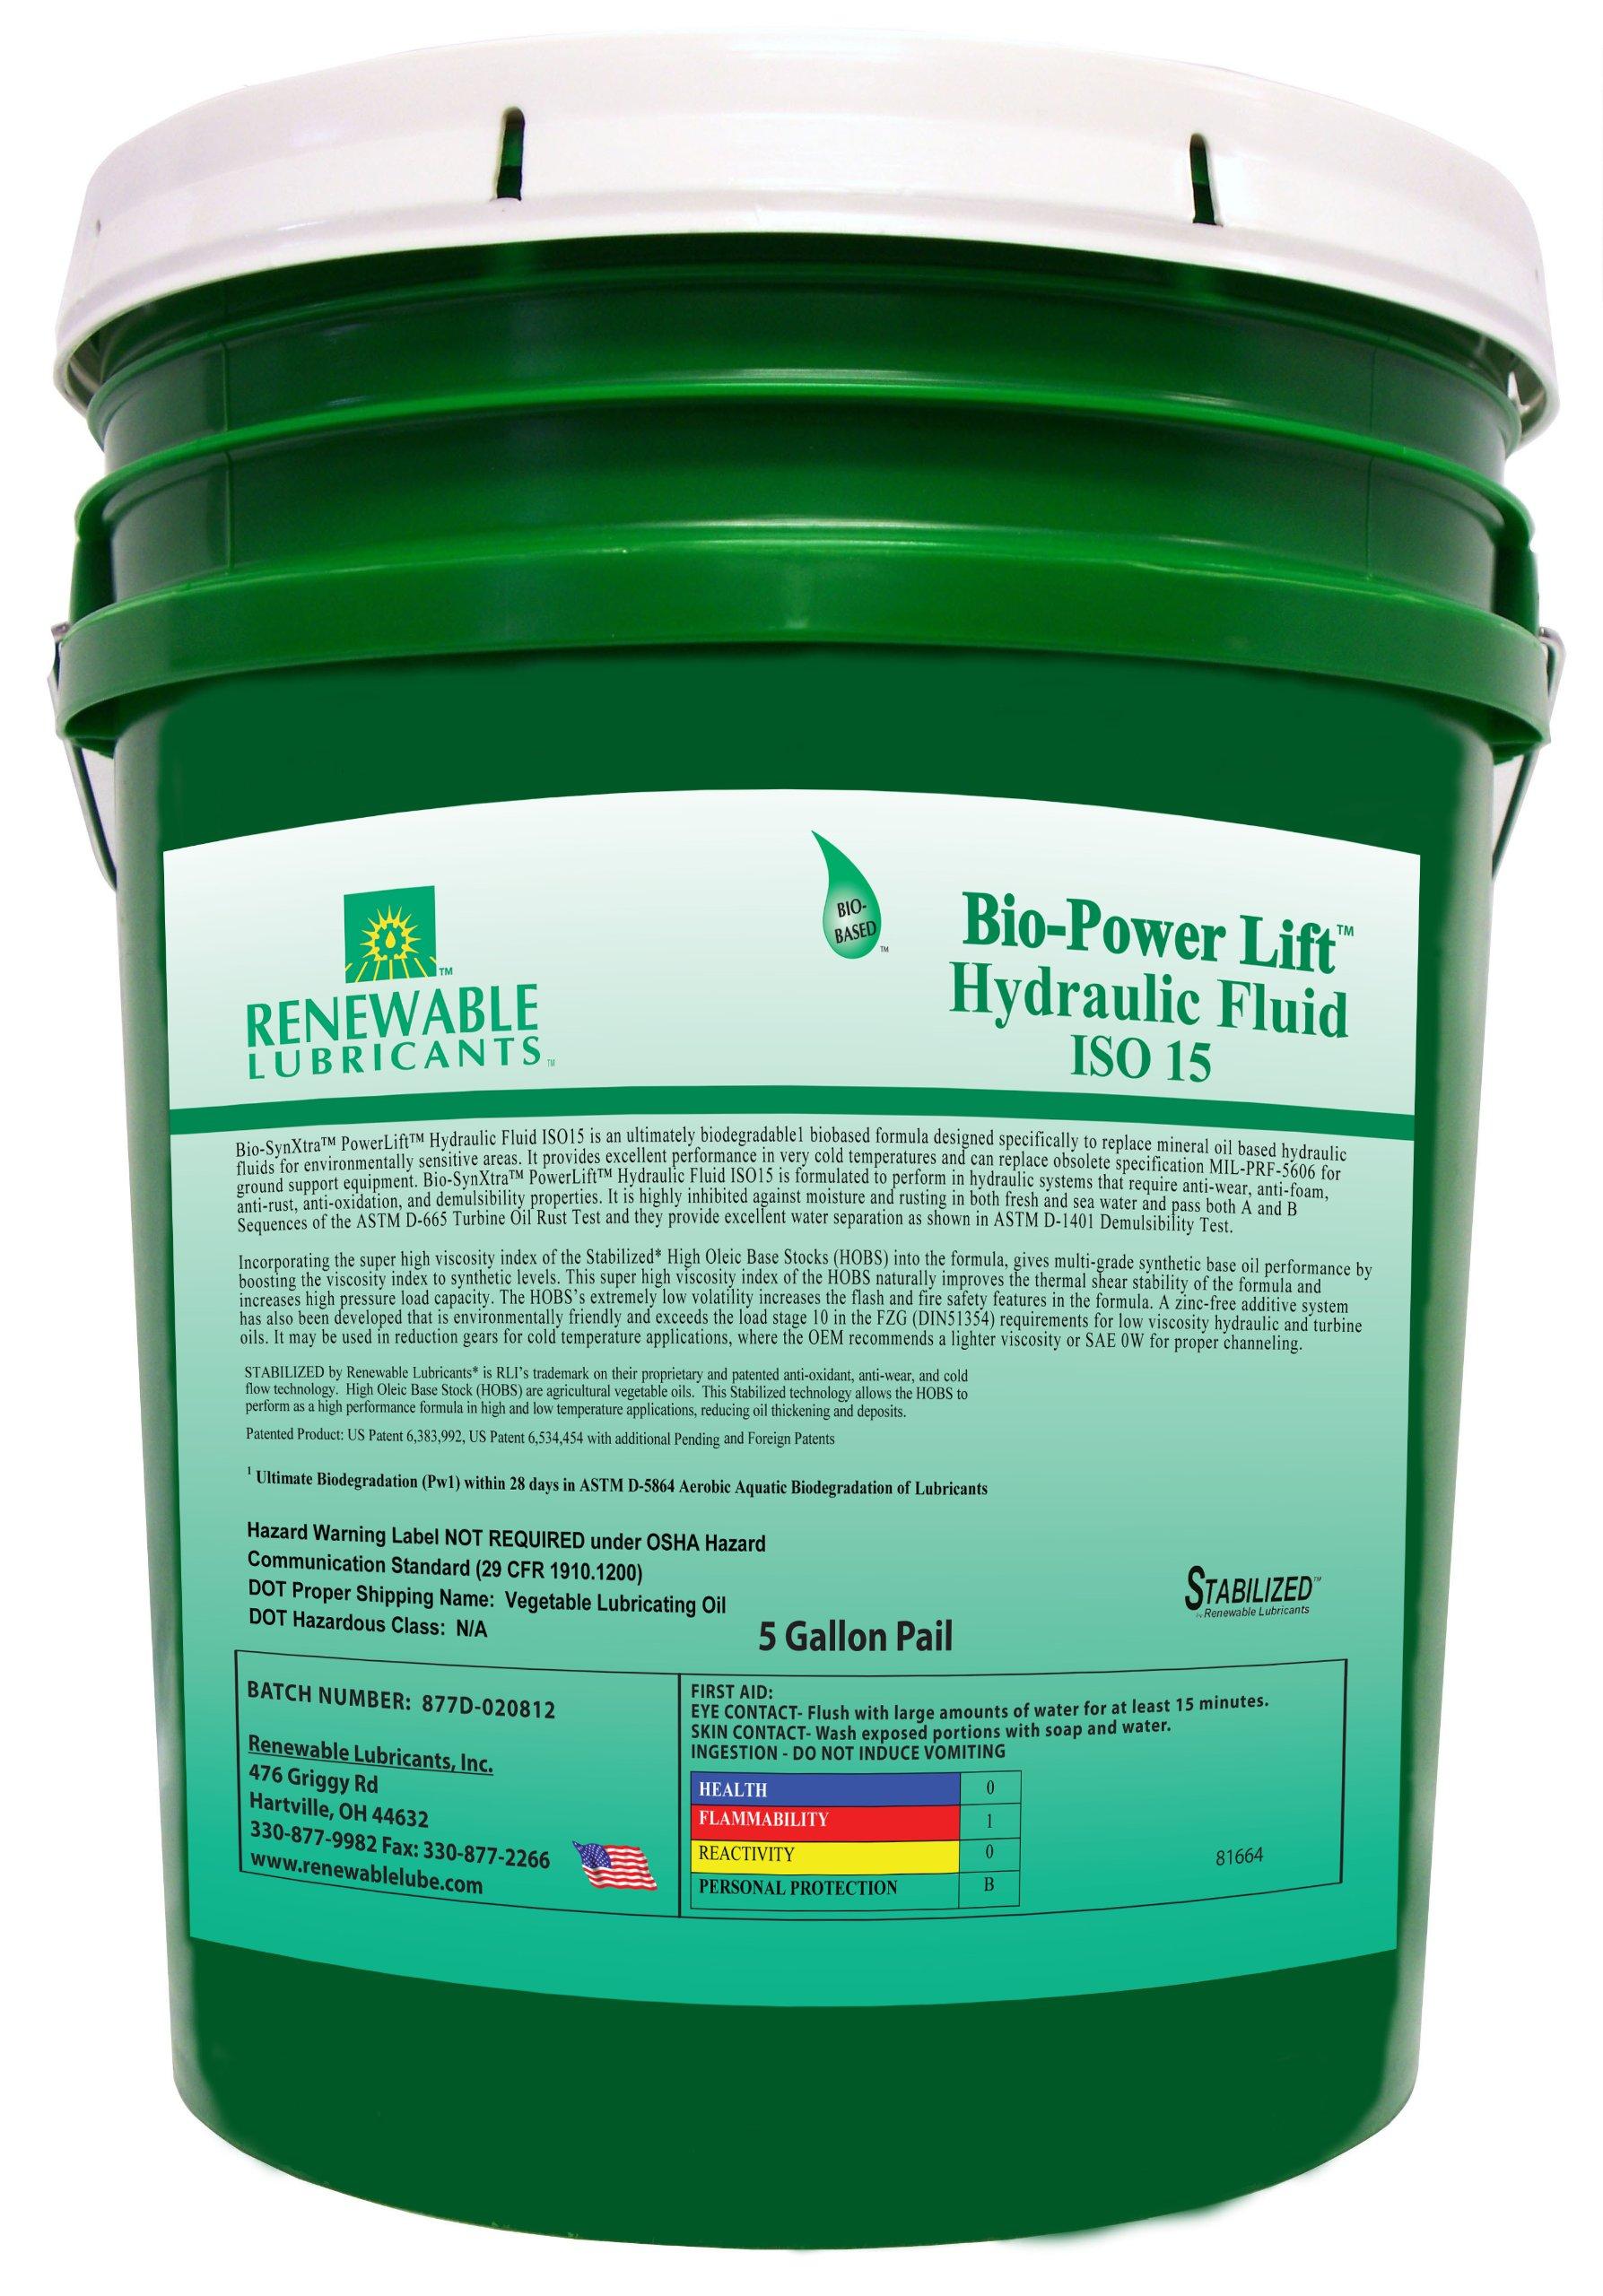 Renewable Lubricants Bio-SynXtra PowerLift Hydraulic Fluid, 5 Gallon Pail